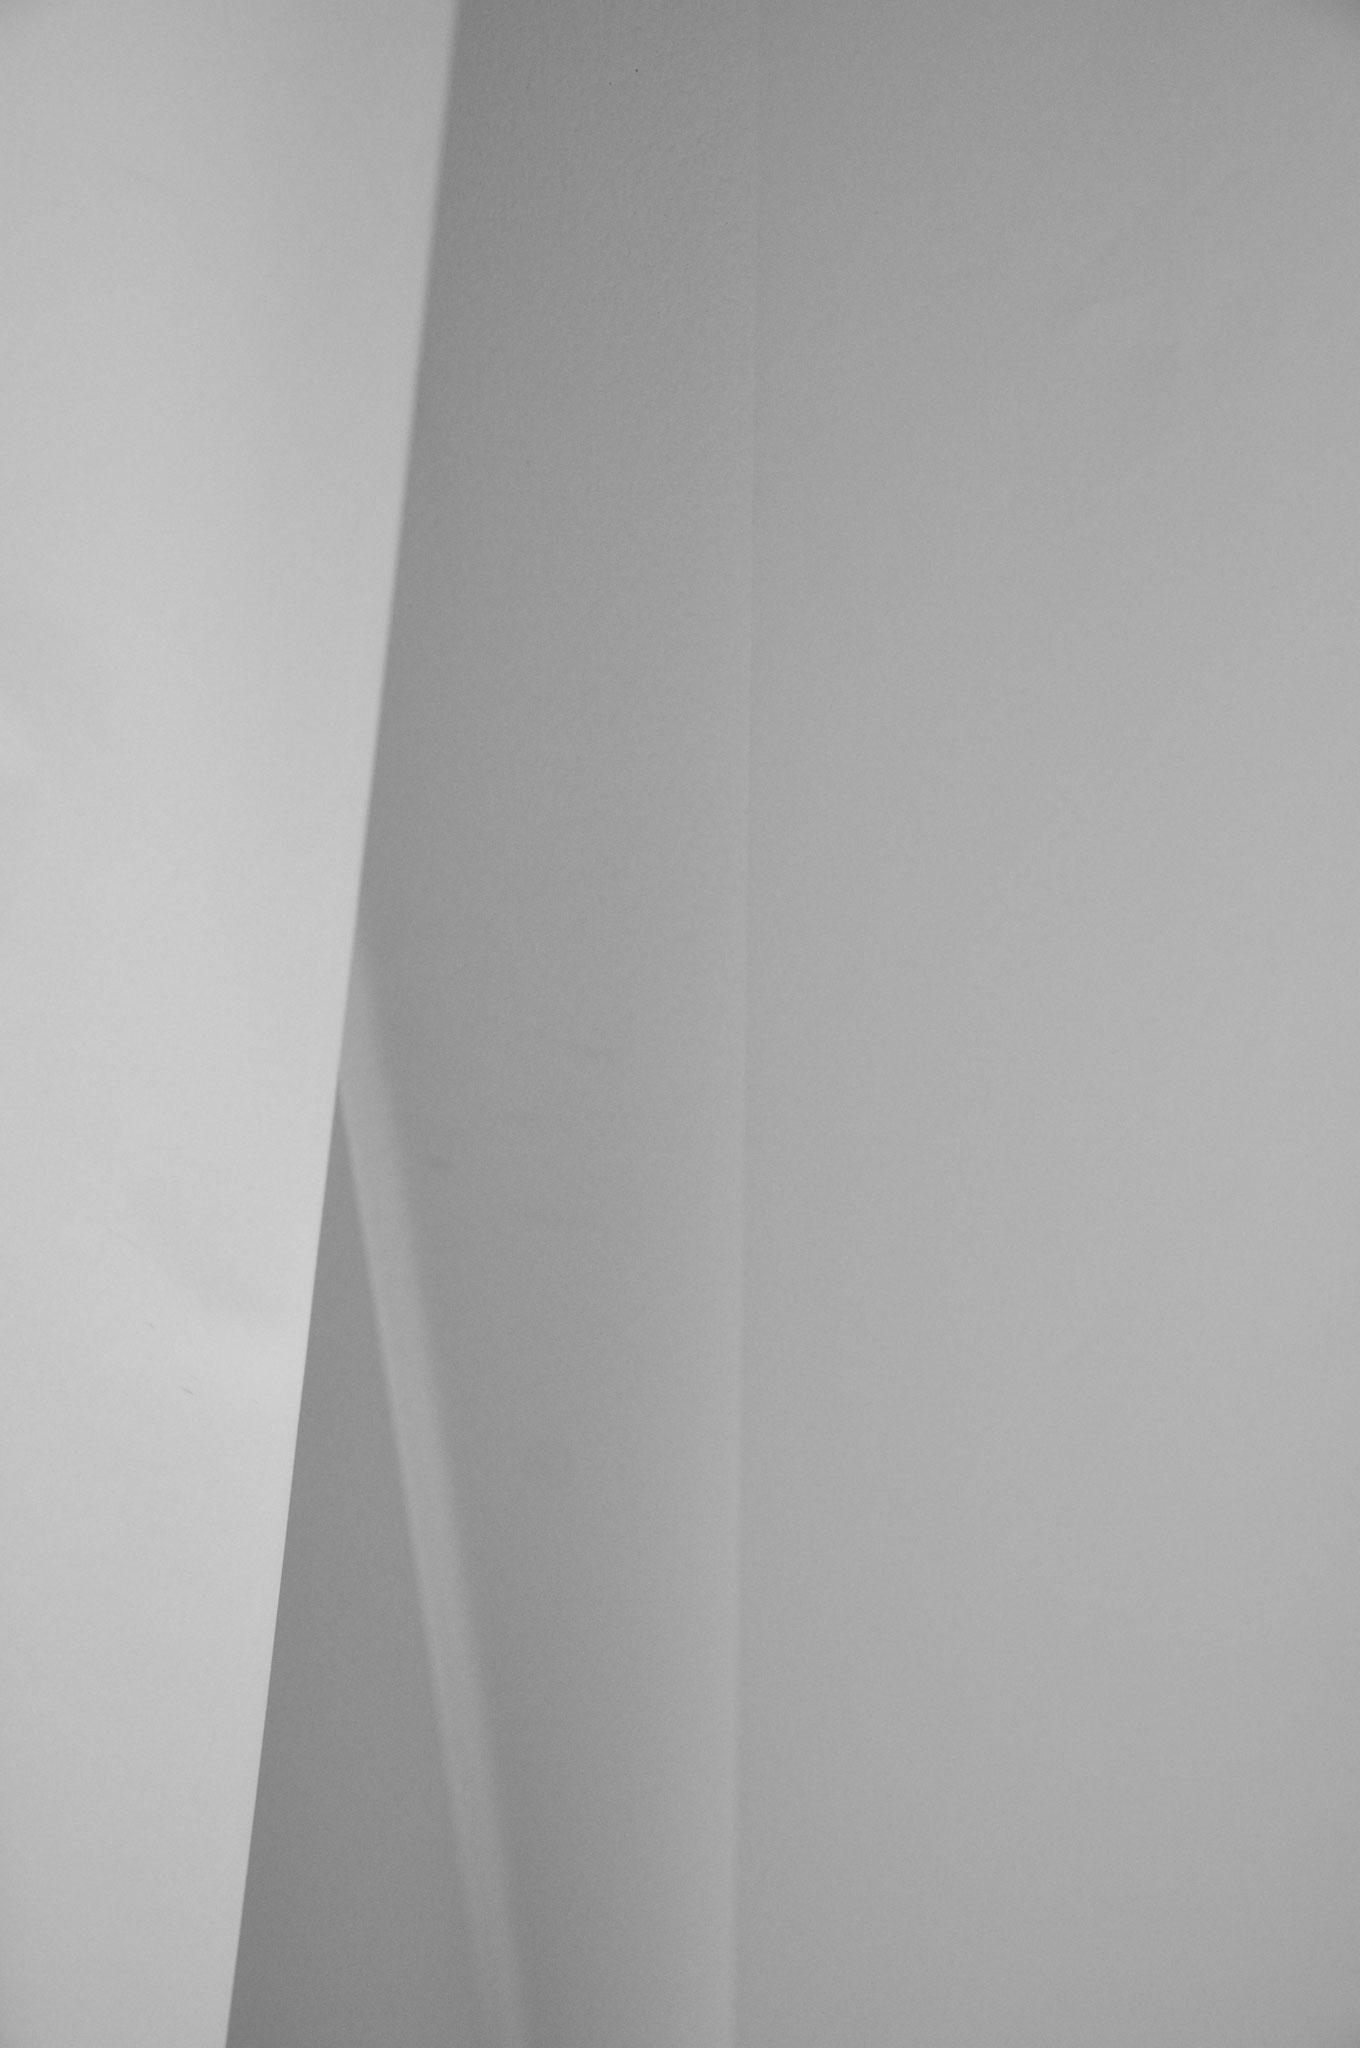 Paper Stills; 2010; Digitalfoto; 60 x 80 cm